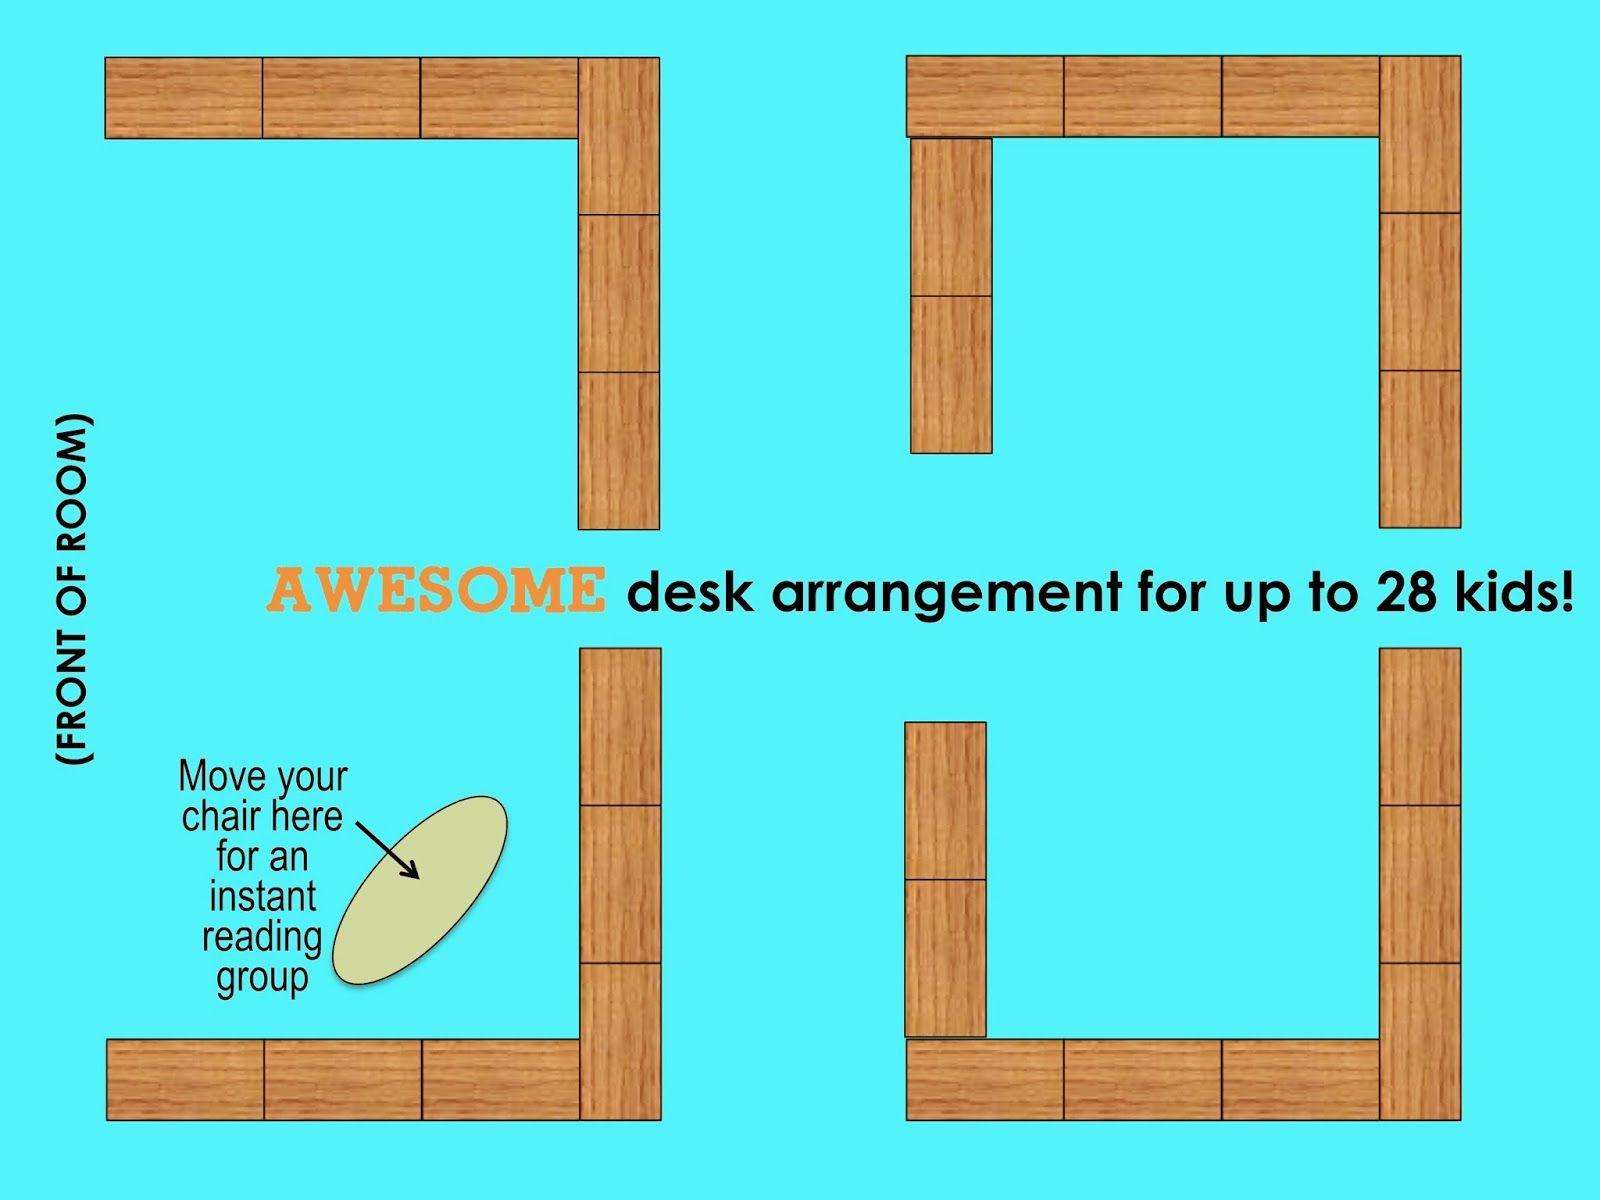 Best Classroom Desk Arrangement Great for reading groups YourTeachersAide Teachingeducation Pinterest